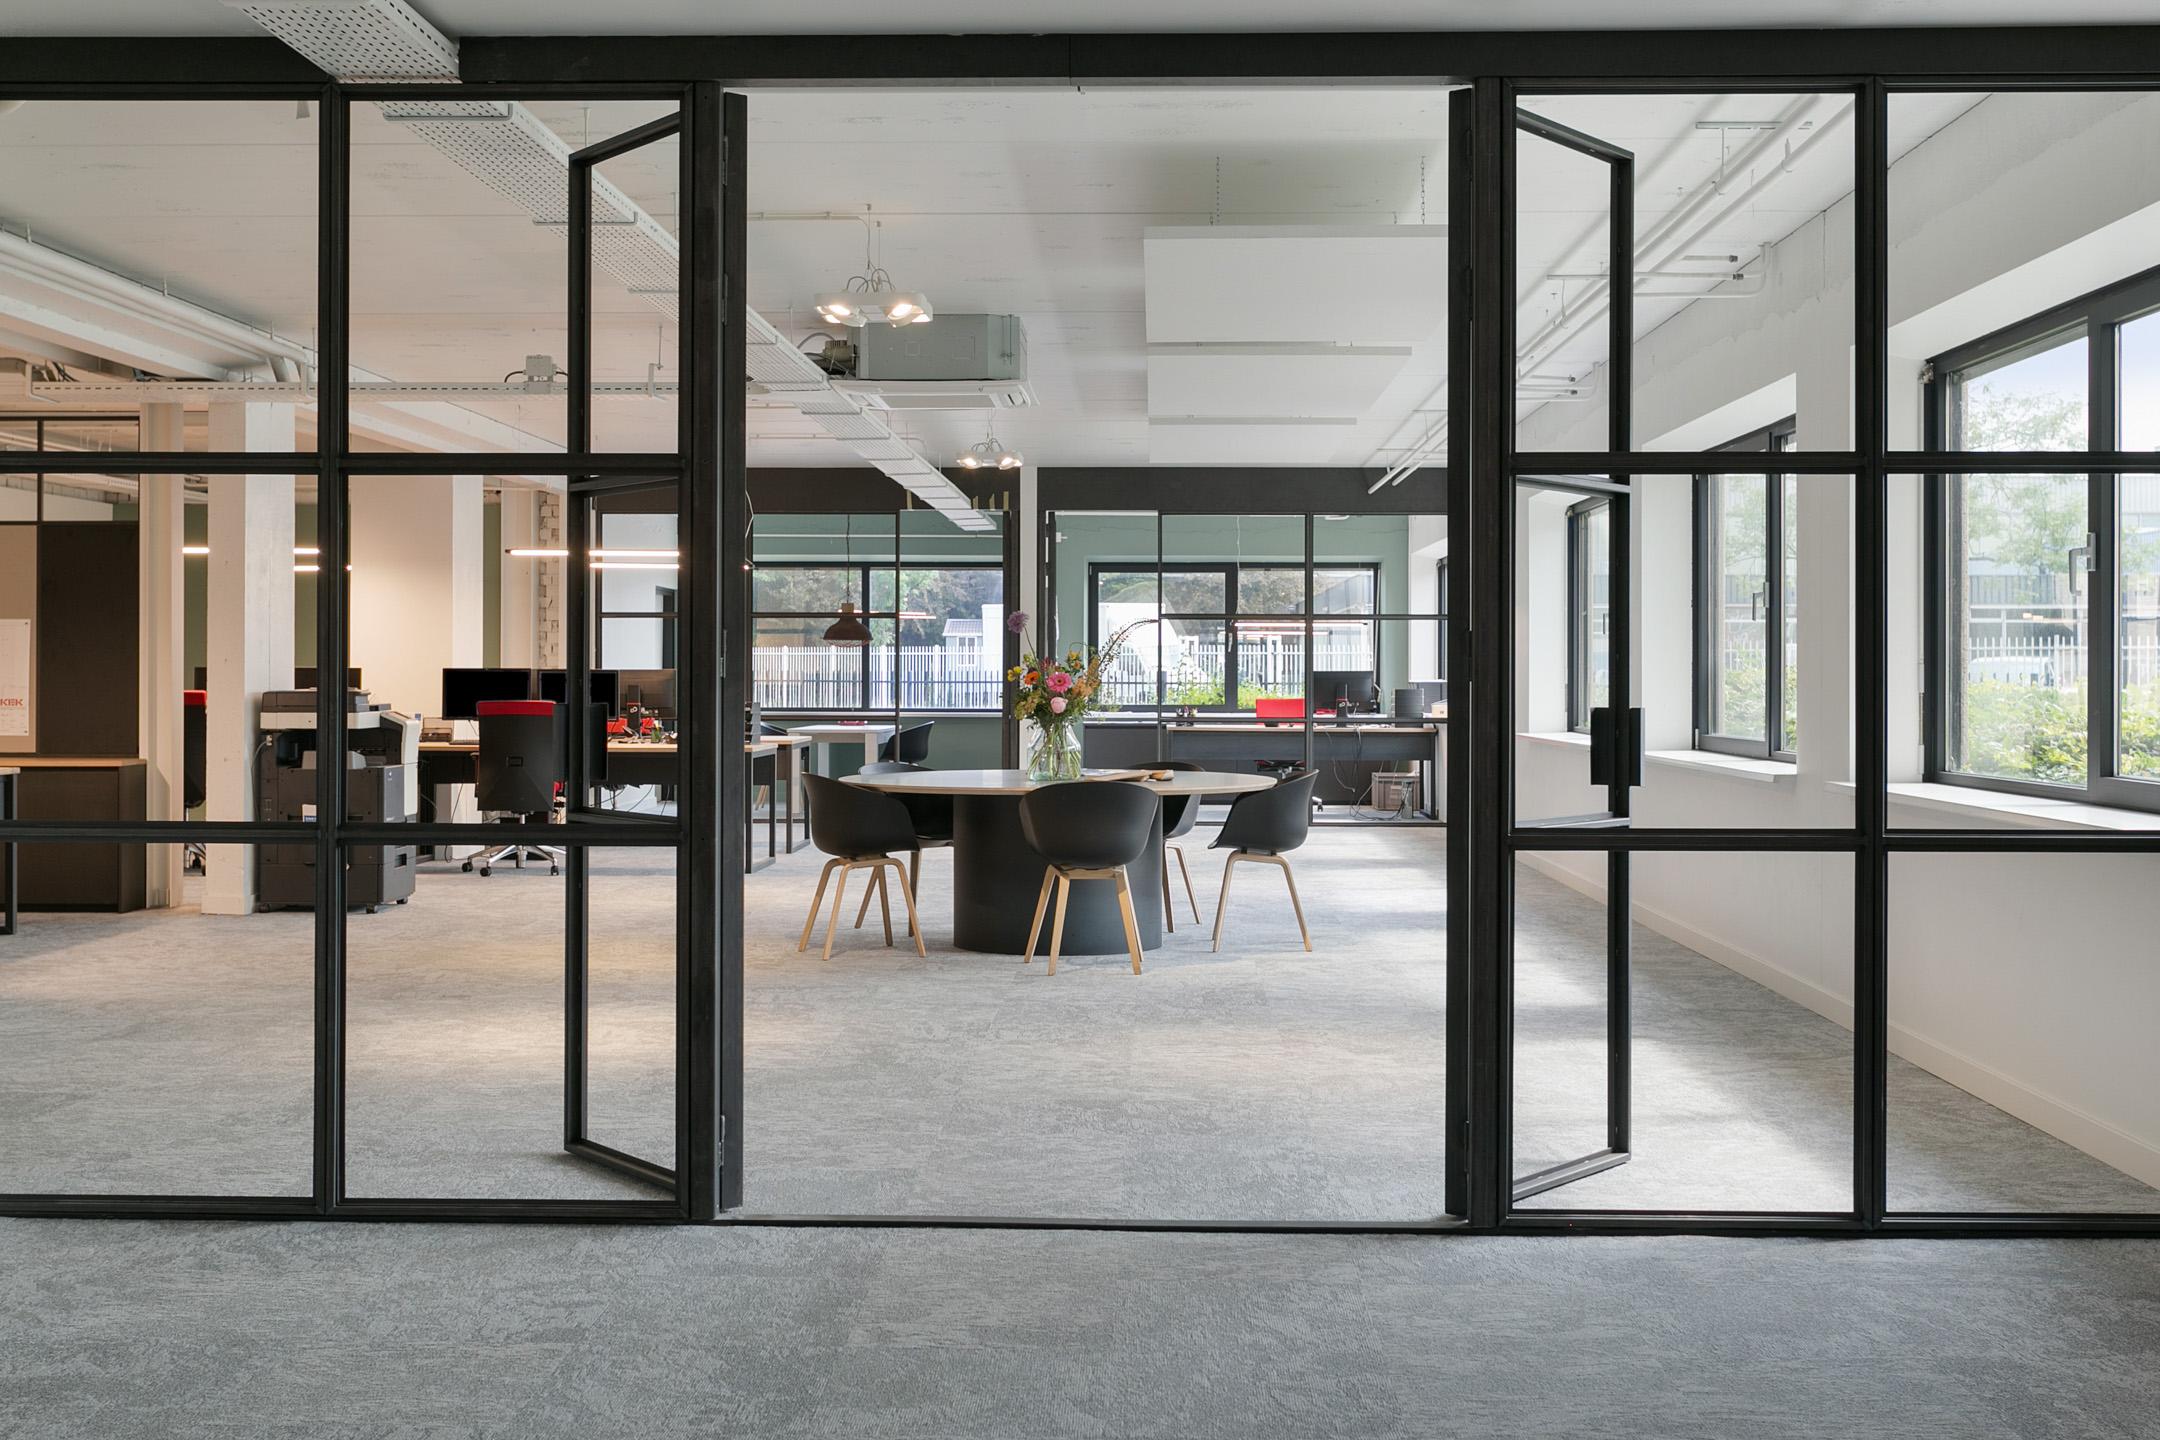 Kantoor Den Bosch Graaf van Solmsweg 111 'sHertogenbosch Kek interieurbouw